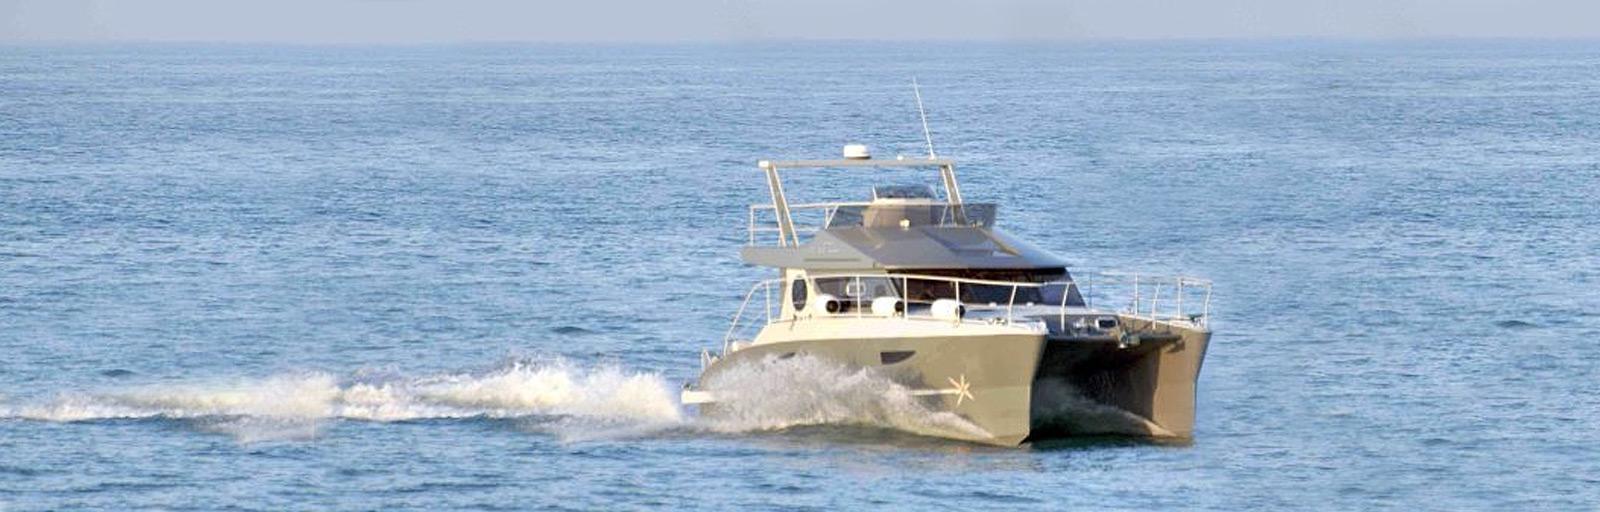 JXX 38' - AYC Yachtbroker